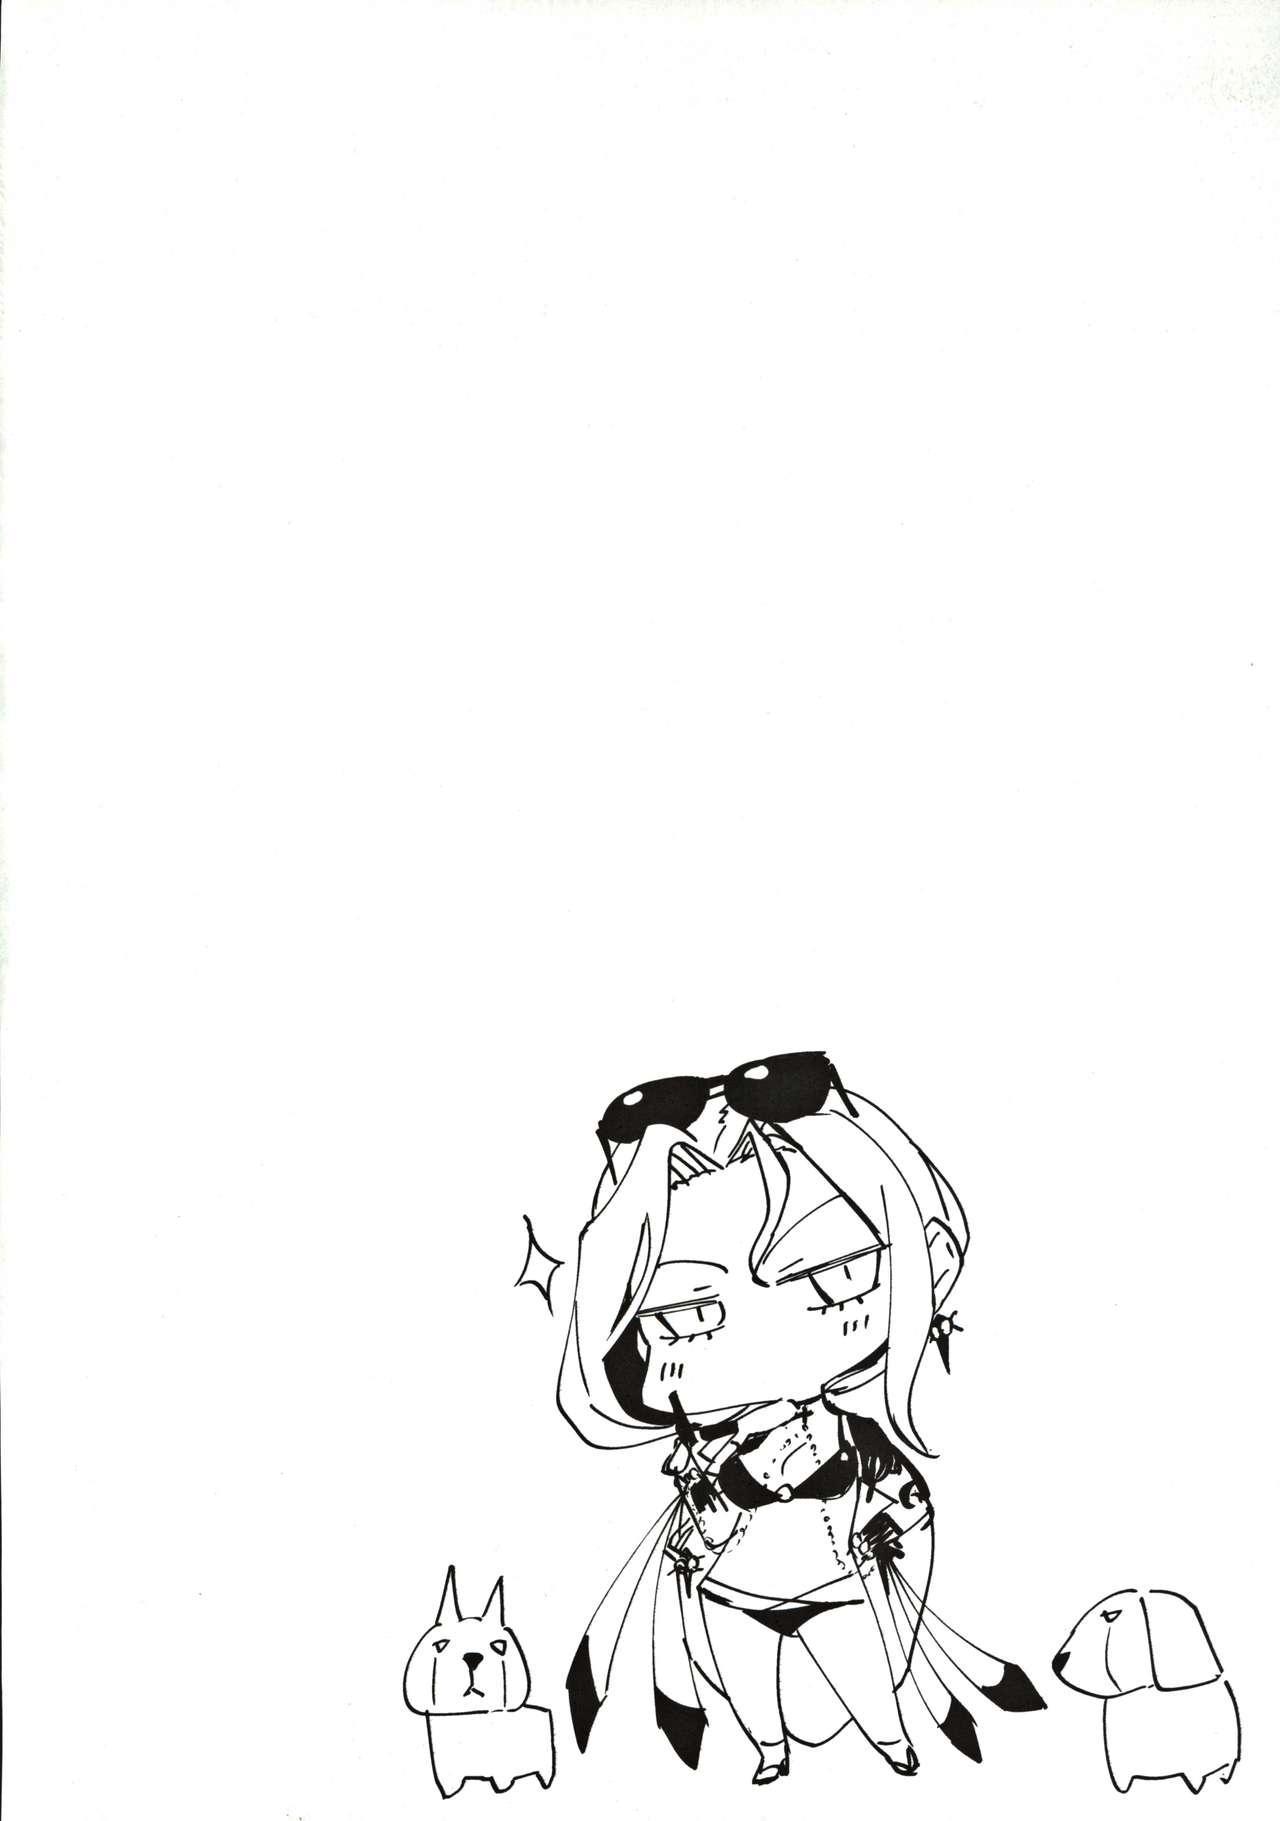 Carmilla-san no Ecchi na no ga Kakitakatta Hon 3